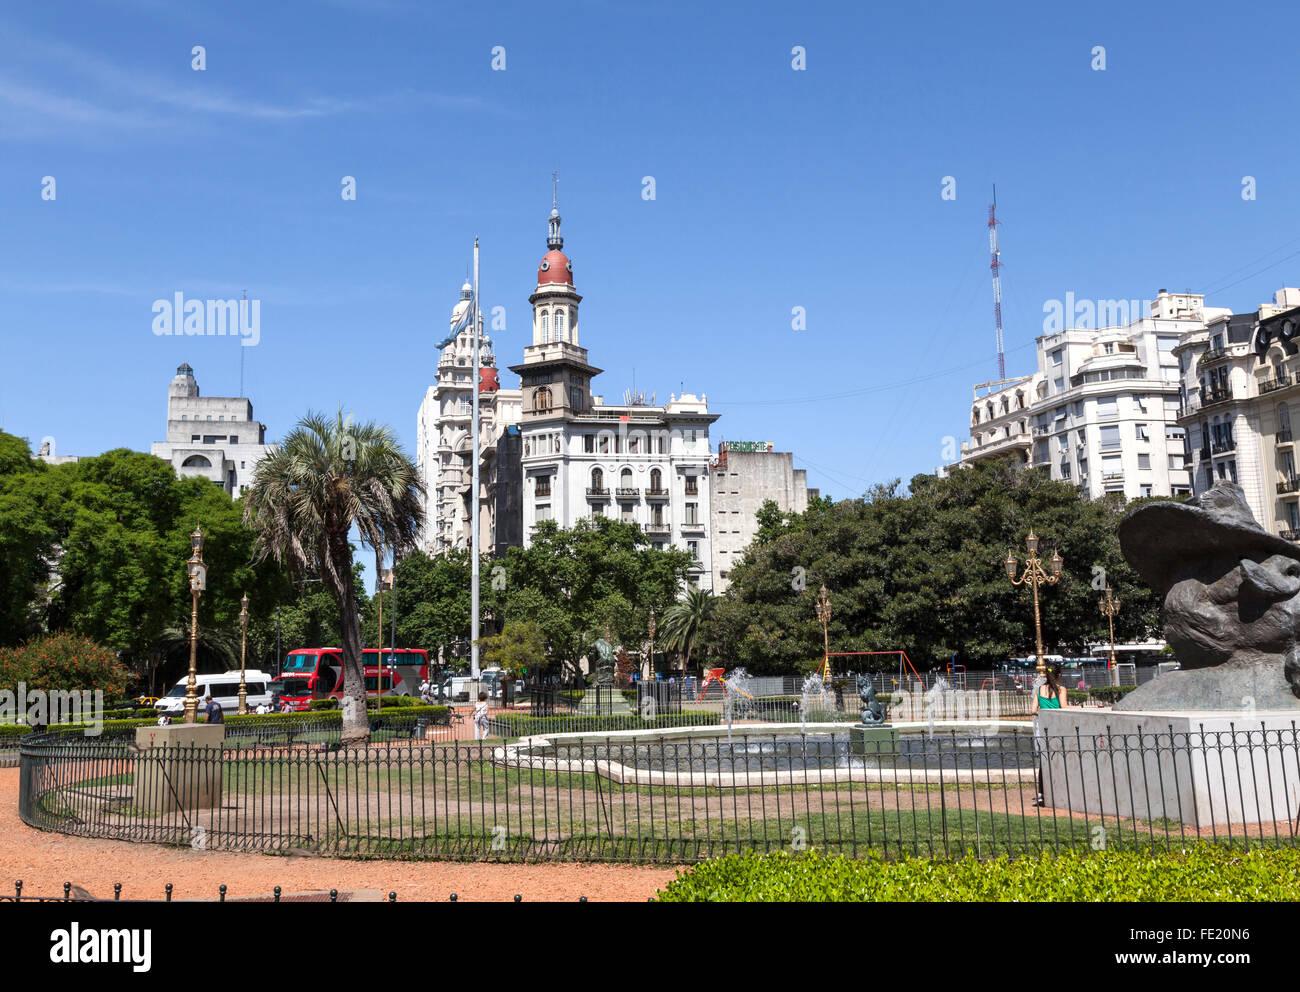 Mariano Moreno Plaza, Buenos Aires Photo Stock